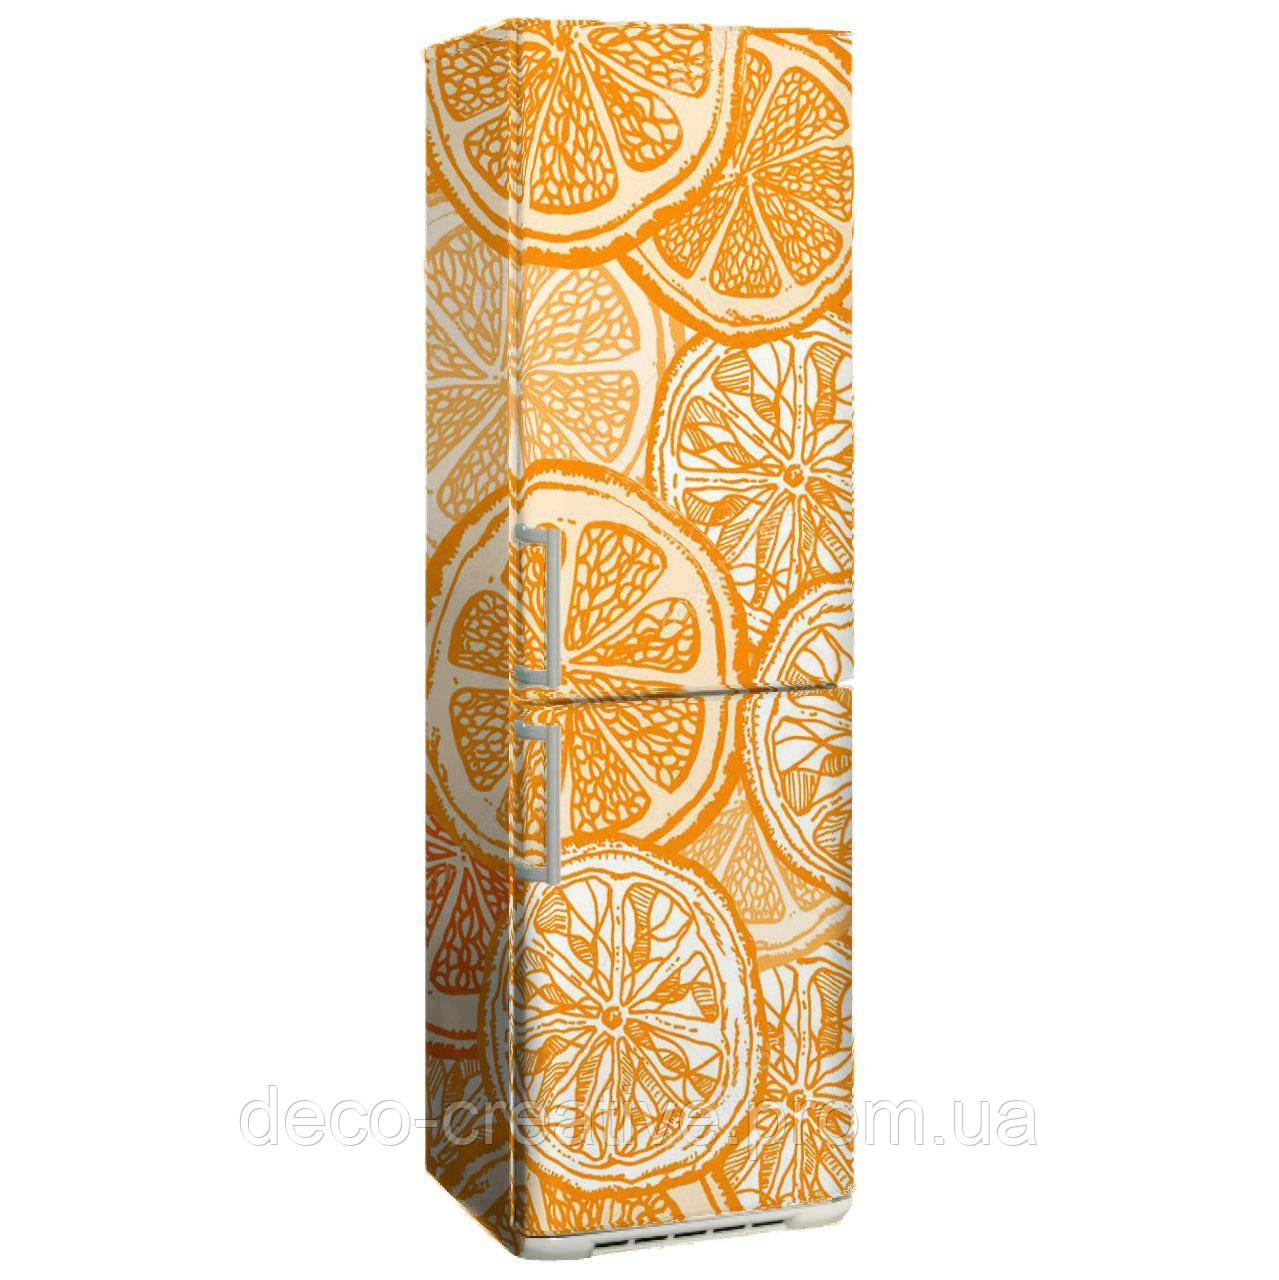 "Наклейка на холодильник ""Апельсинка винтаж"""